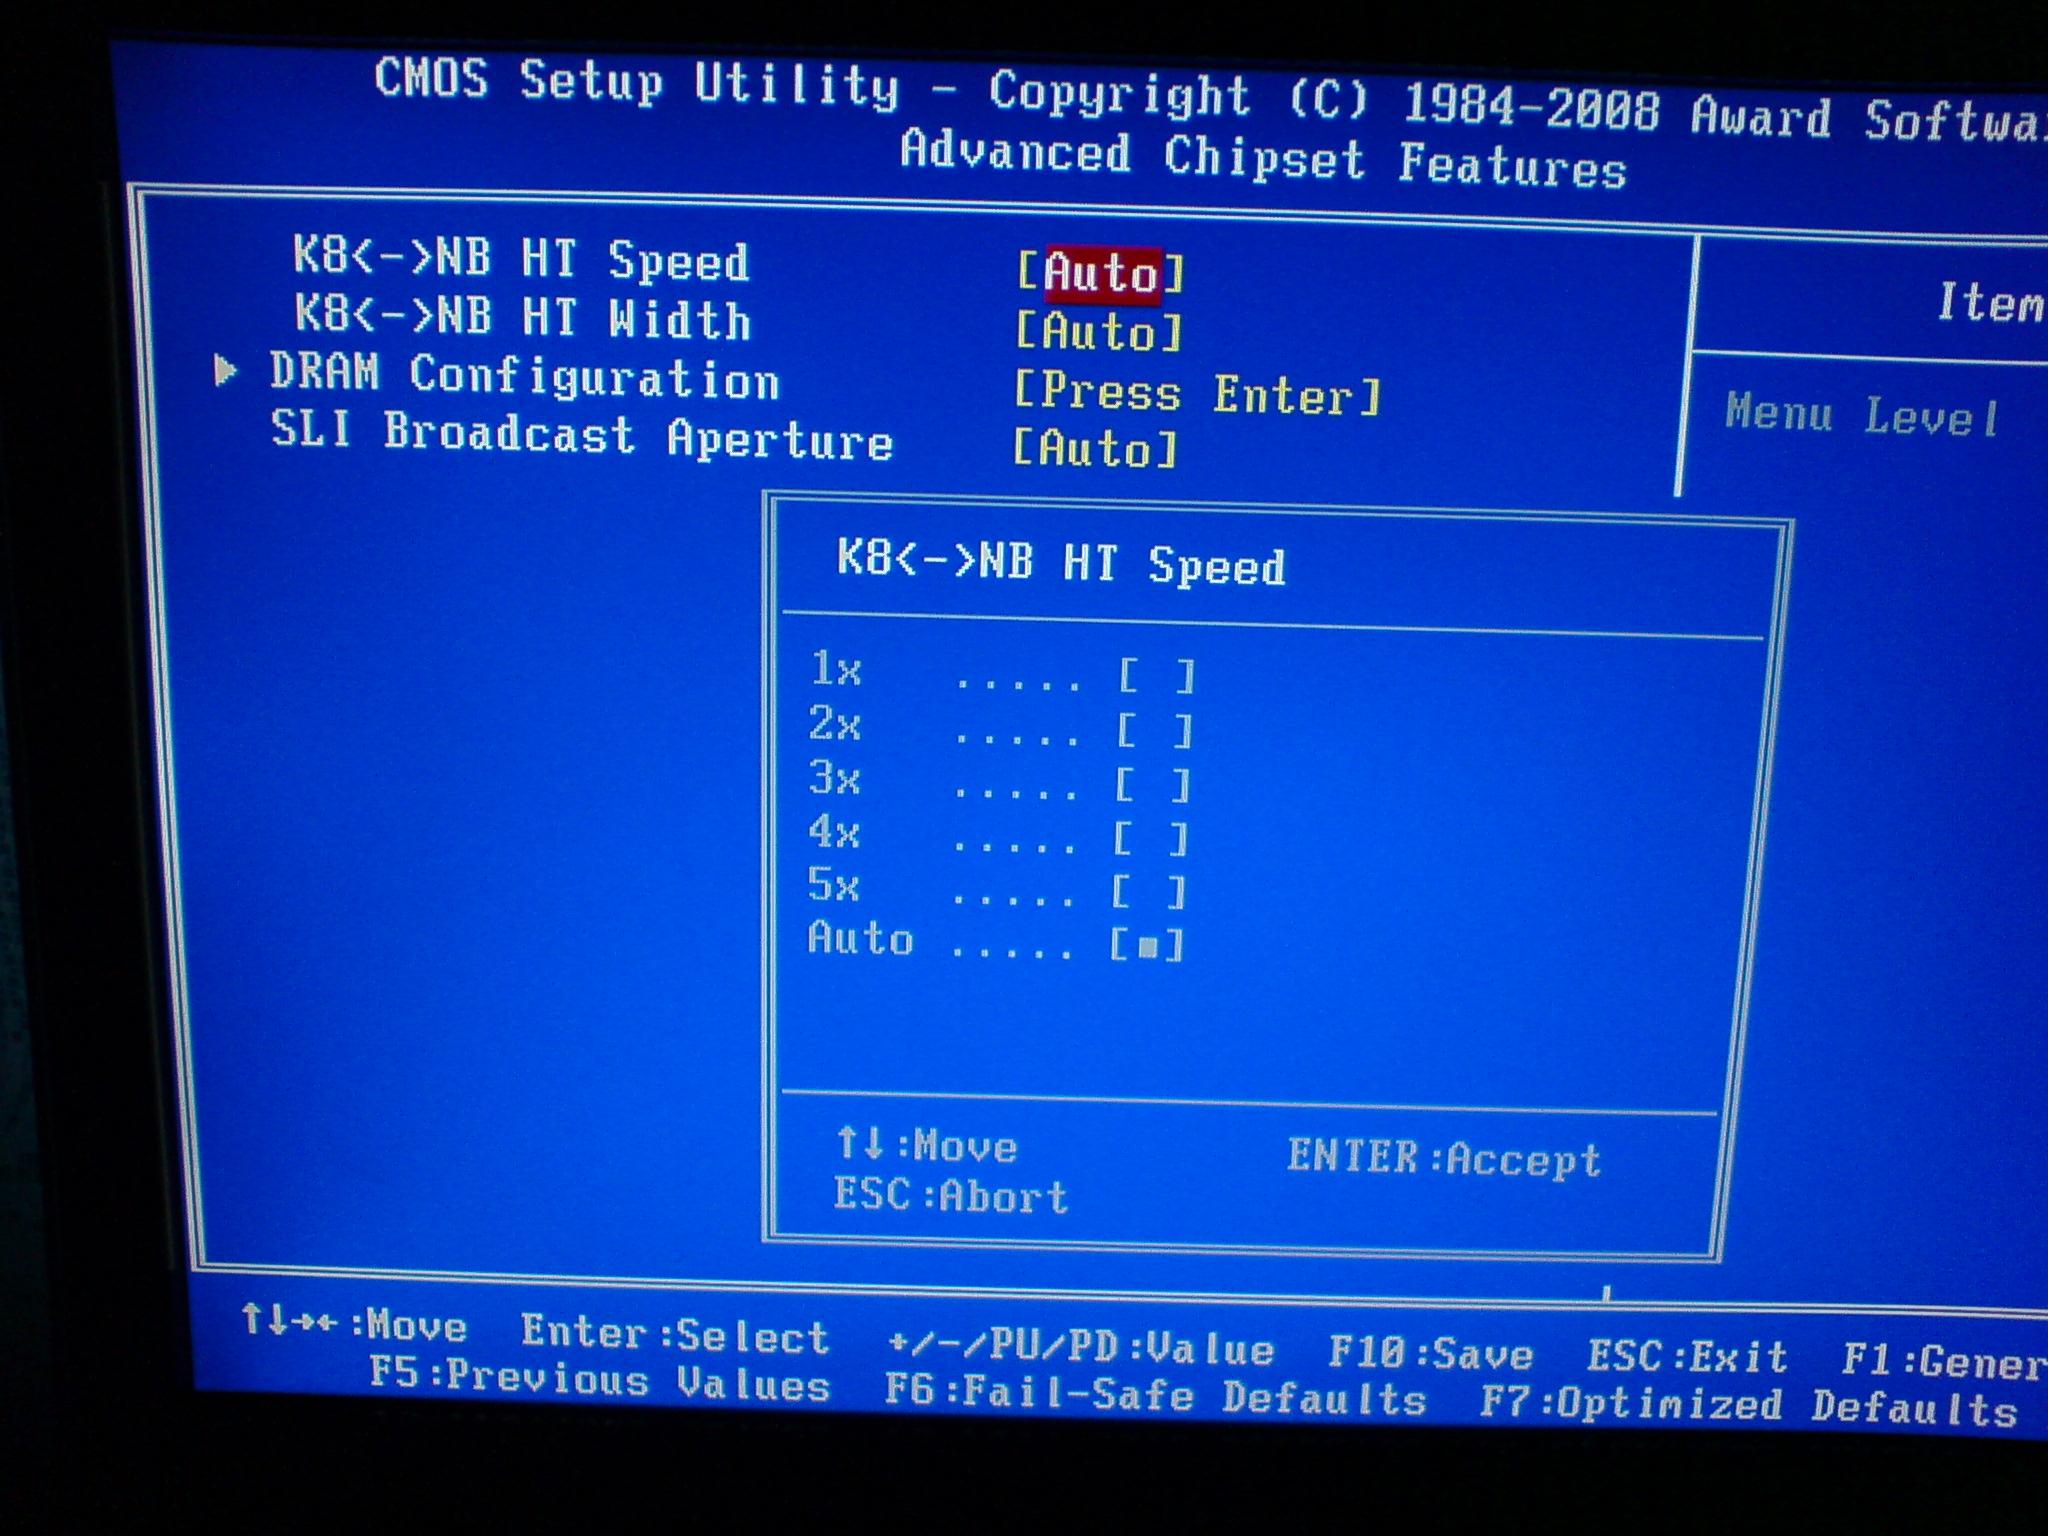 AMD Athlon II x2 240 problemy z OC - elektroda pl